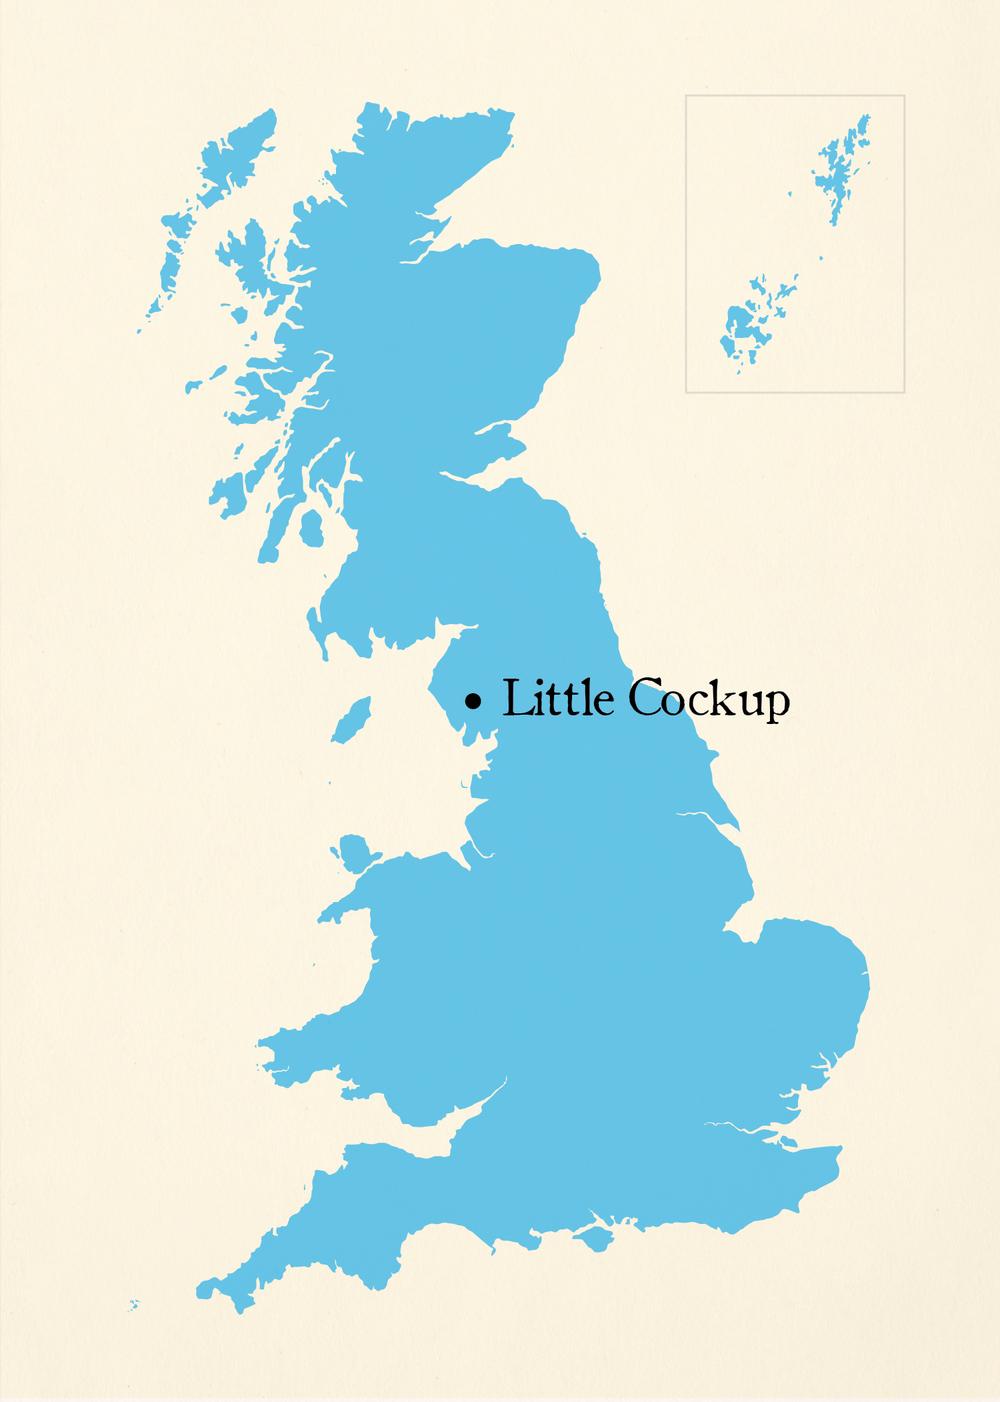 Little Cockup